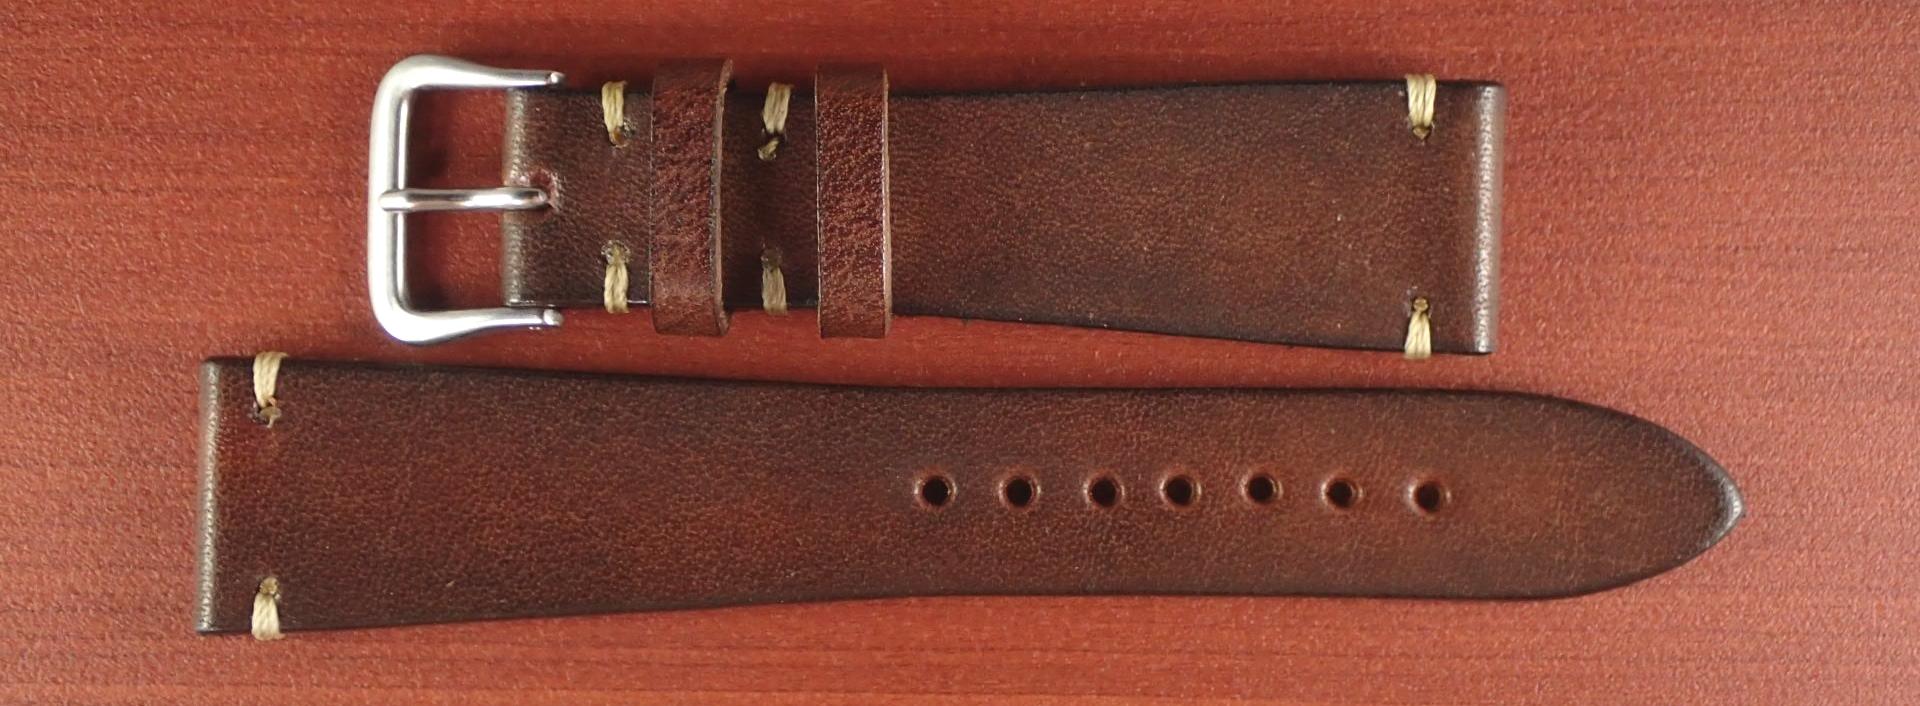 C × V 牛ヌメ革ベルト レギュラー ブラウン 18、20mm